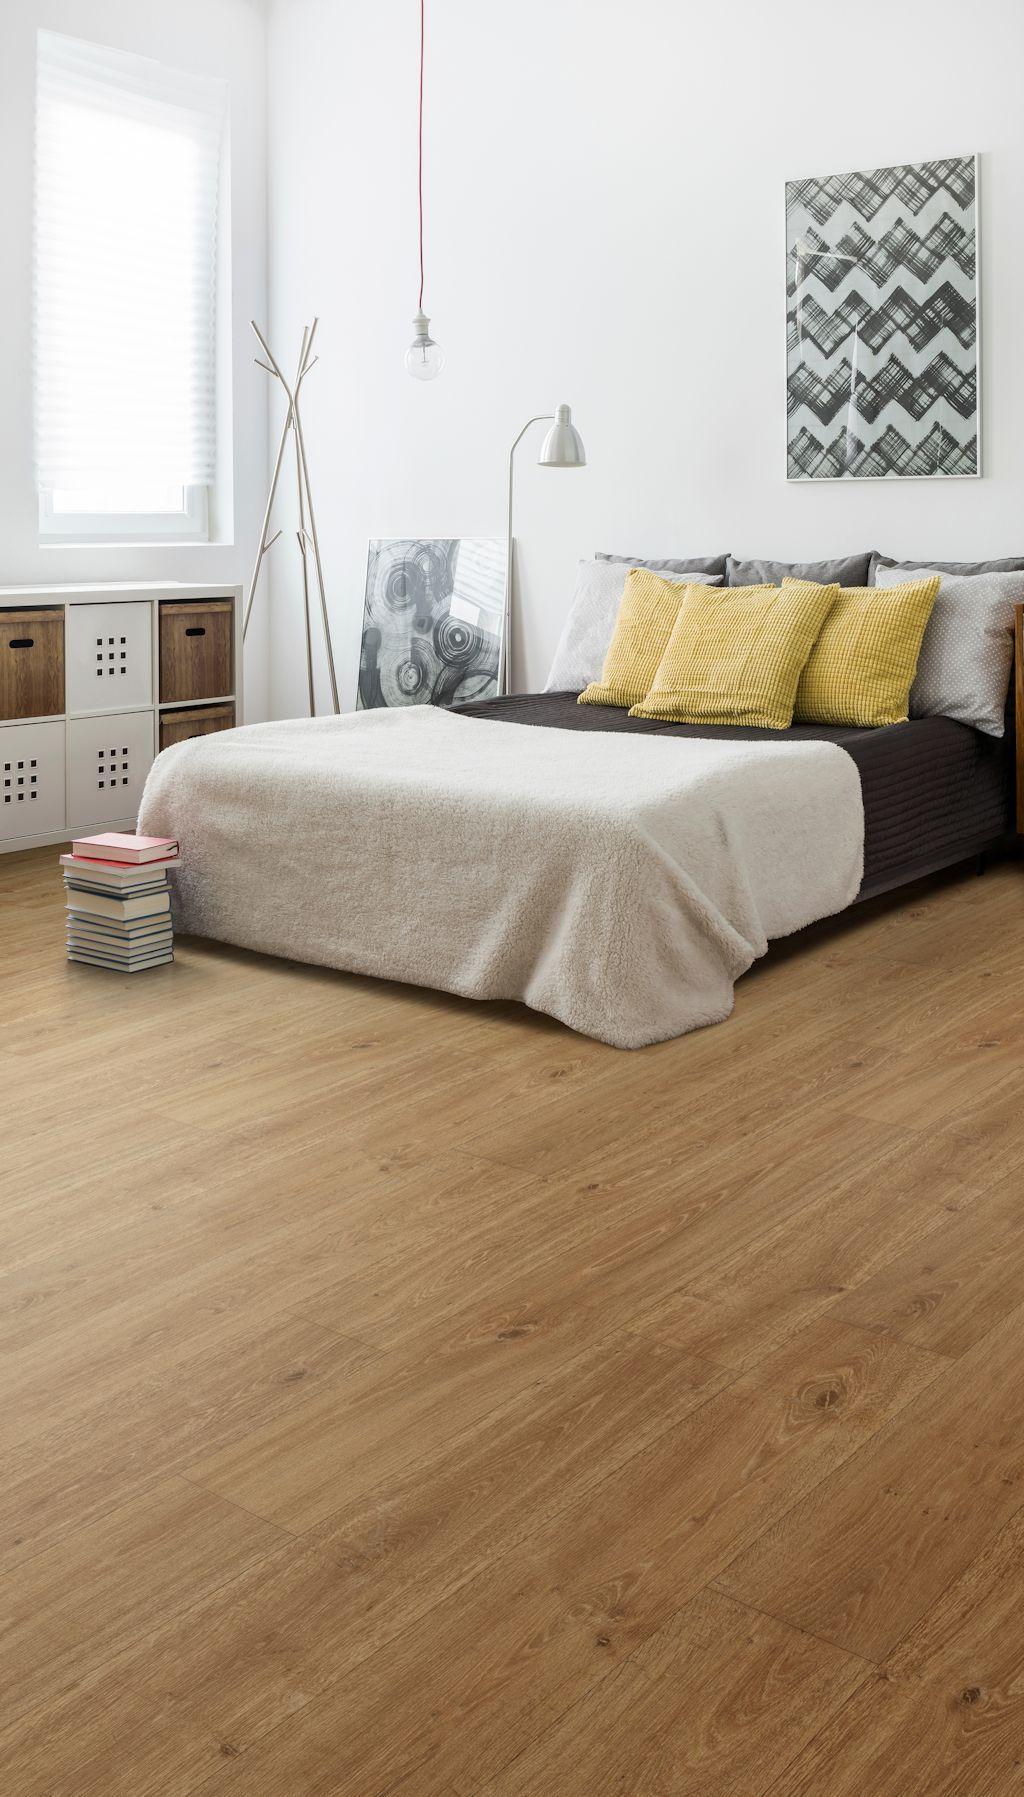 Bedroom Featuring Secura Pur Luxury Vinyl Sheet Flooring In Honey